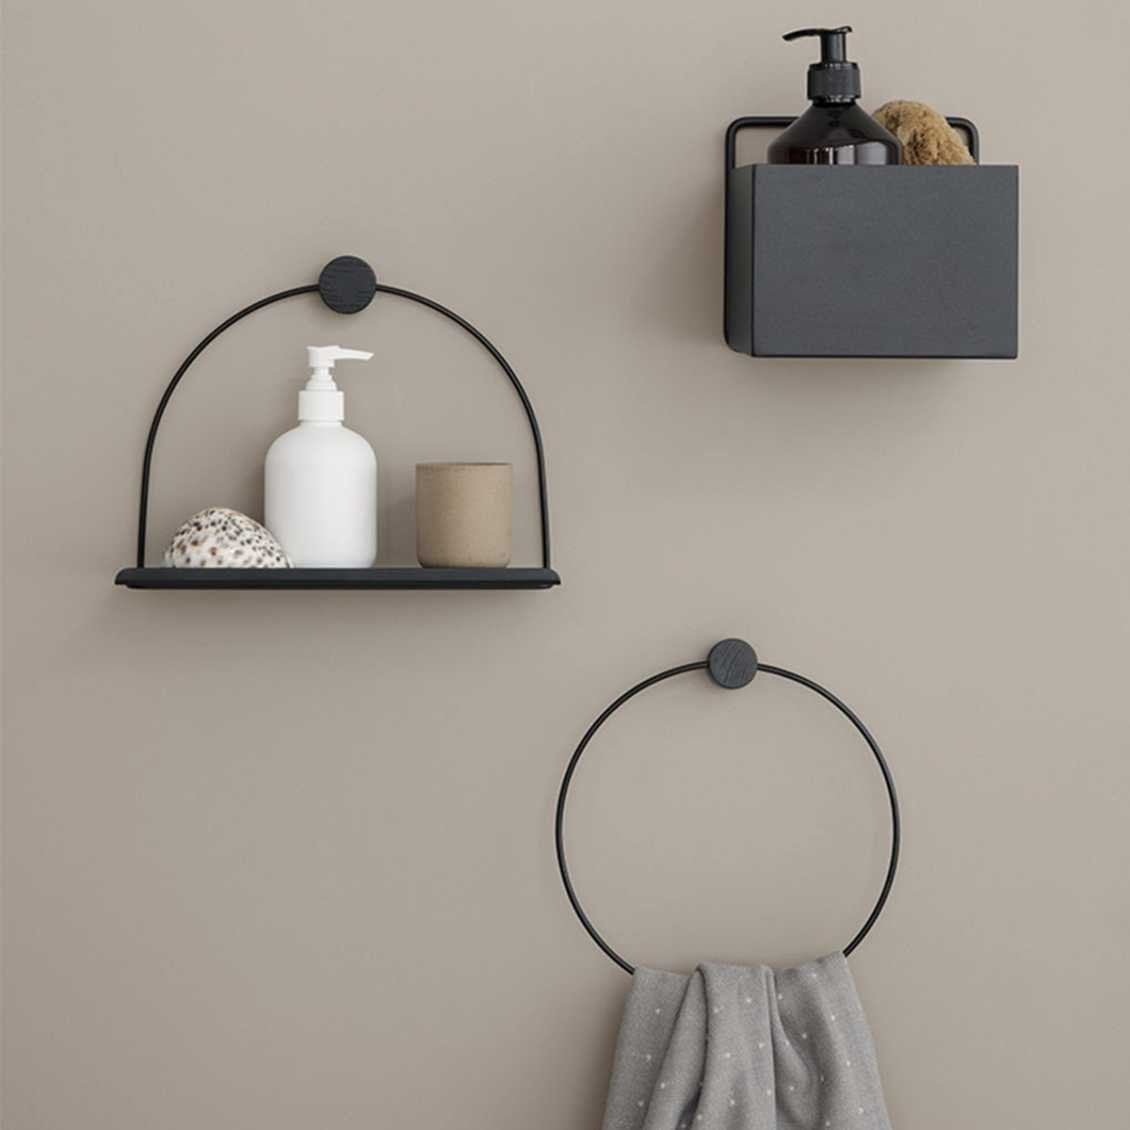 Black Towel Hanger Handdoek Hanger Ferm Living Misterdesign Wandregal Bad Badezimmer Schwarz Bad Styling